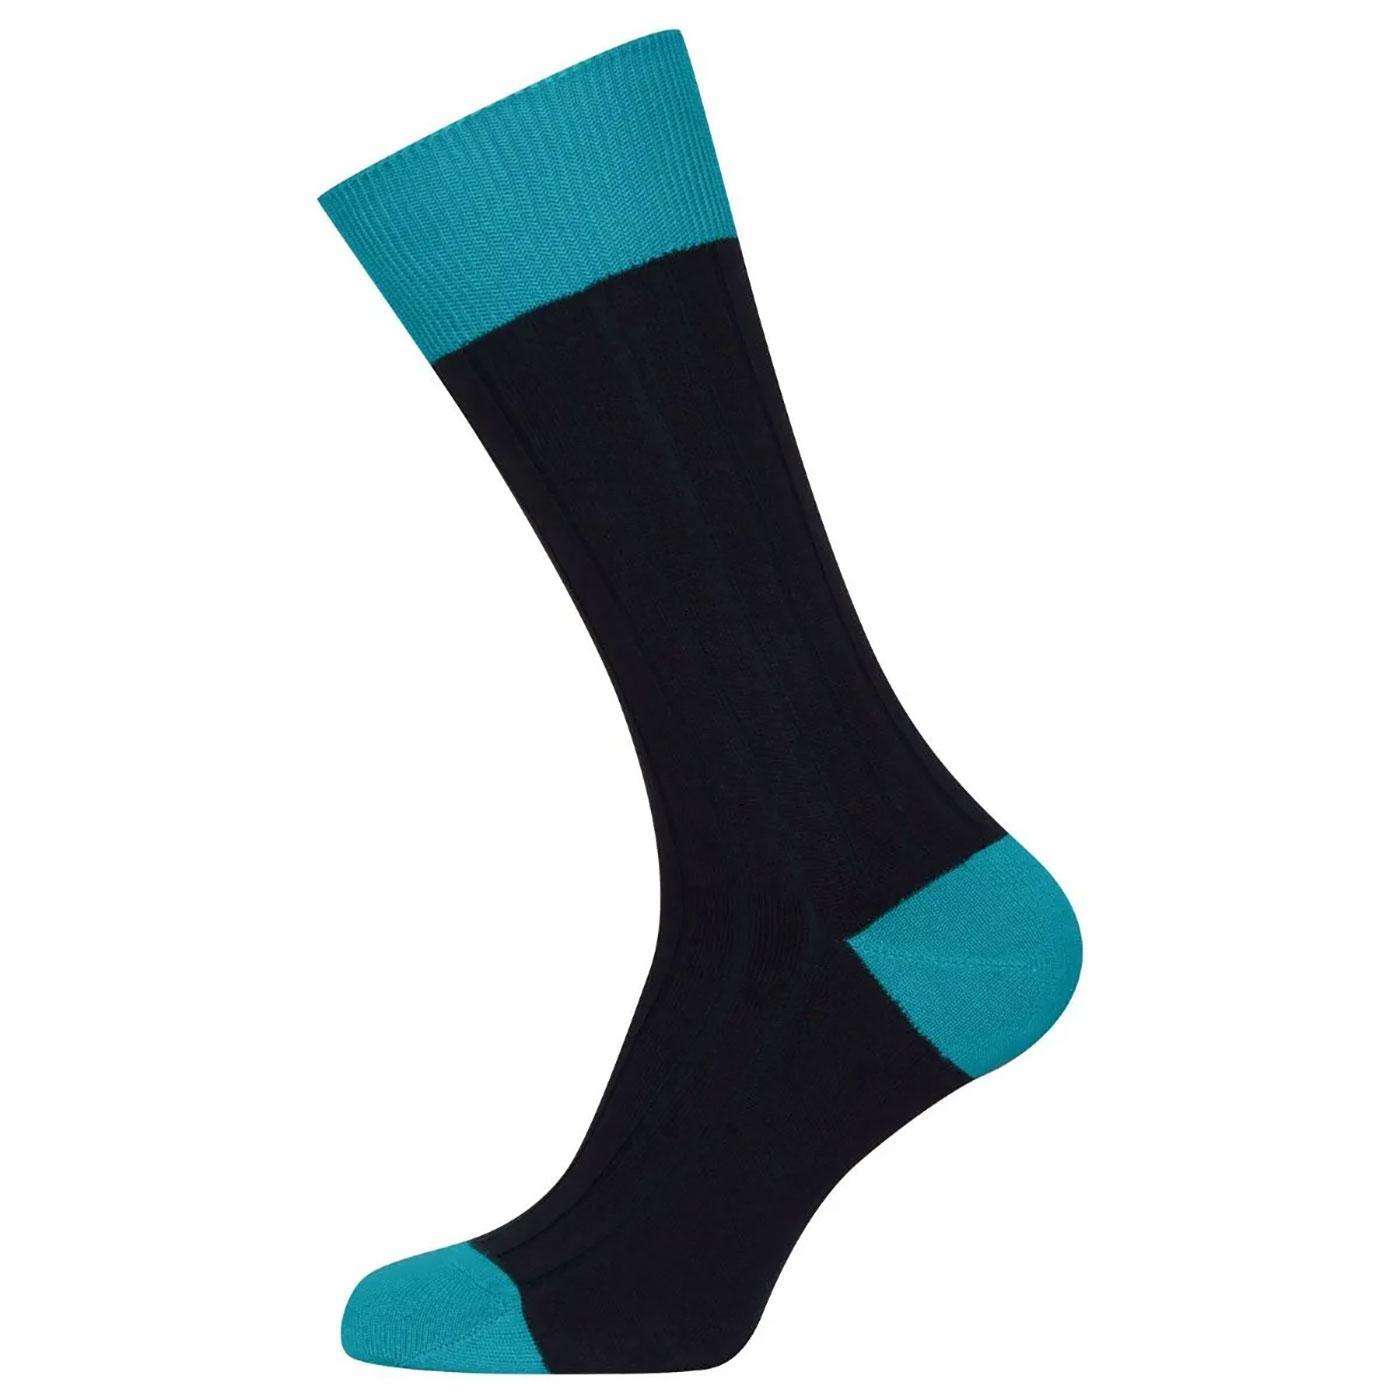 + Gamma JOHN SMEDLEY Ribbed Cotton Blend Socks N/B